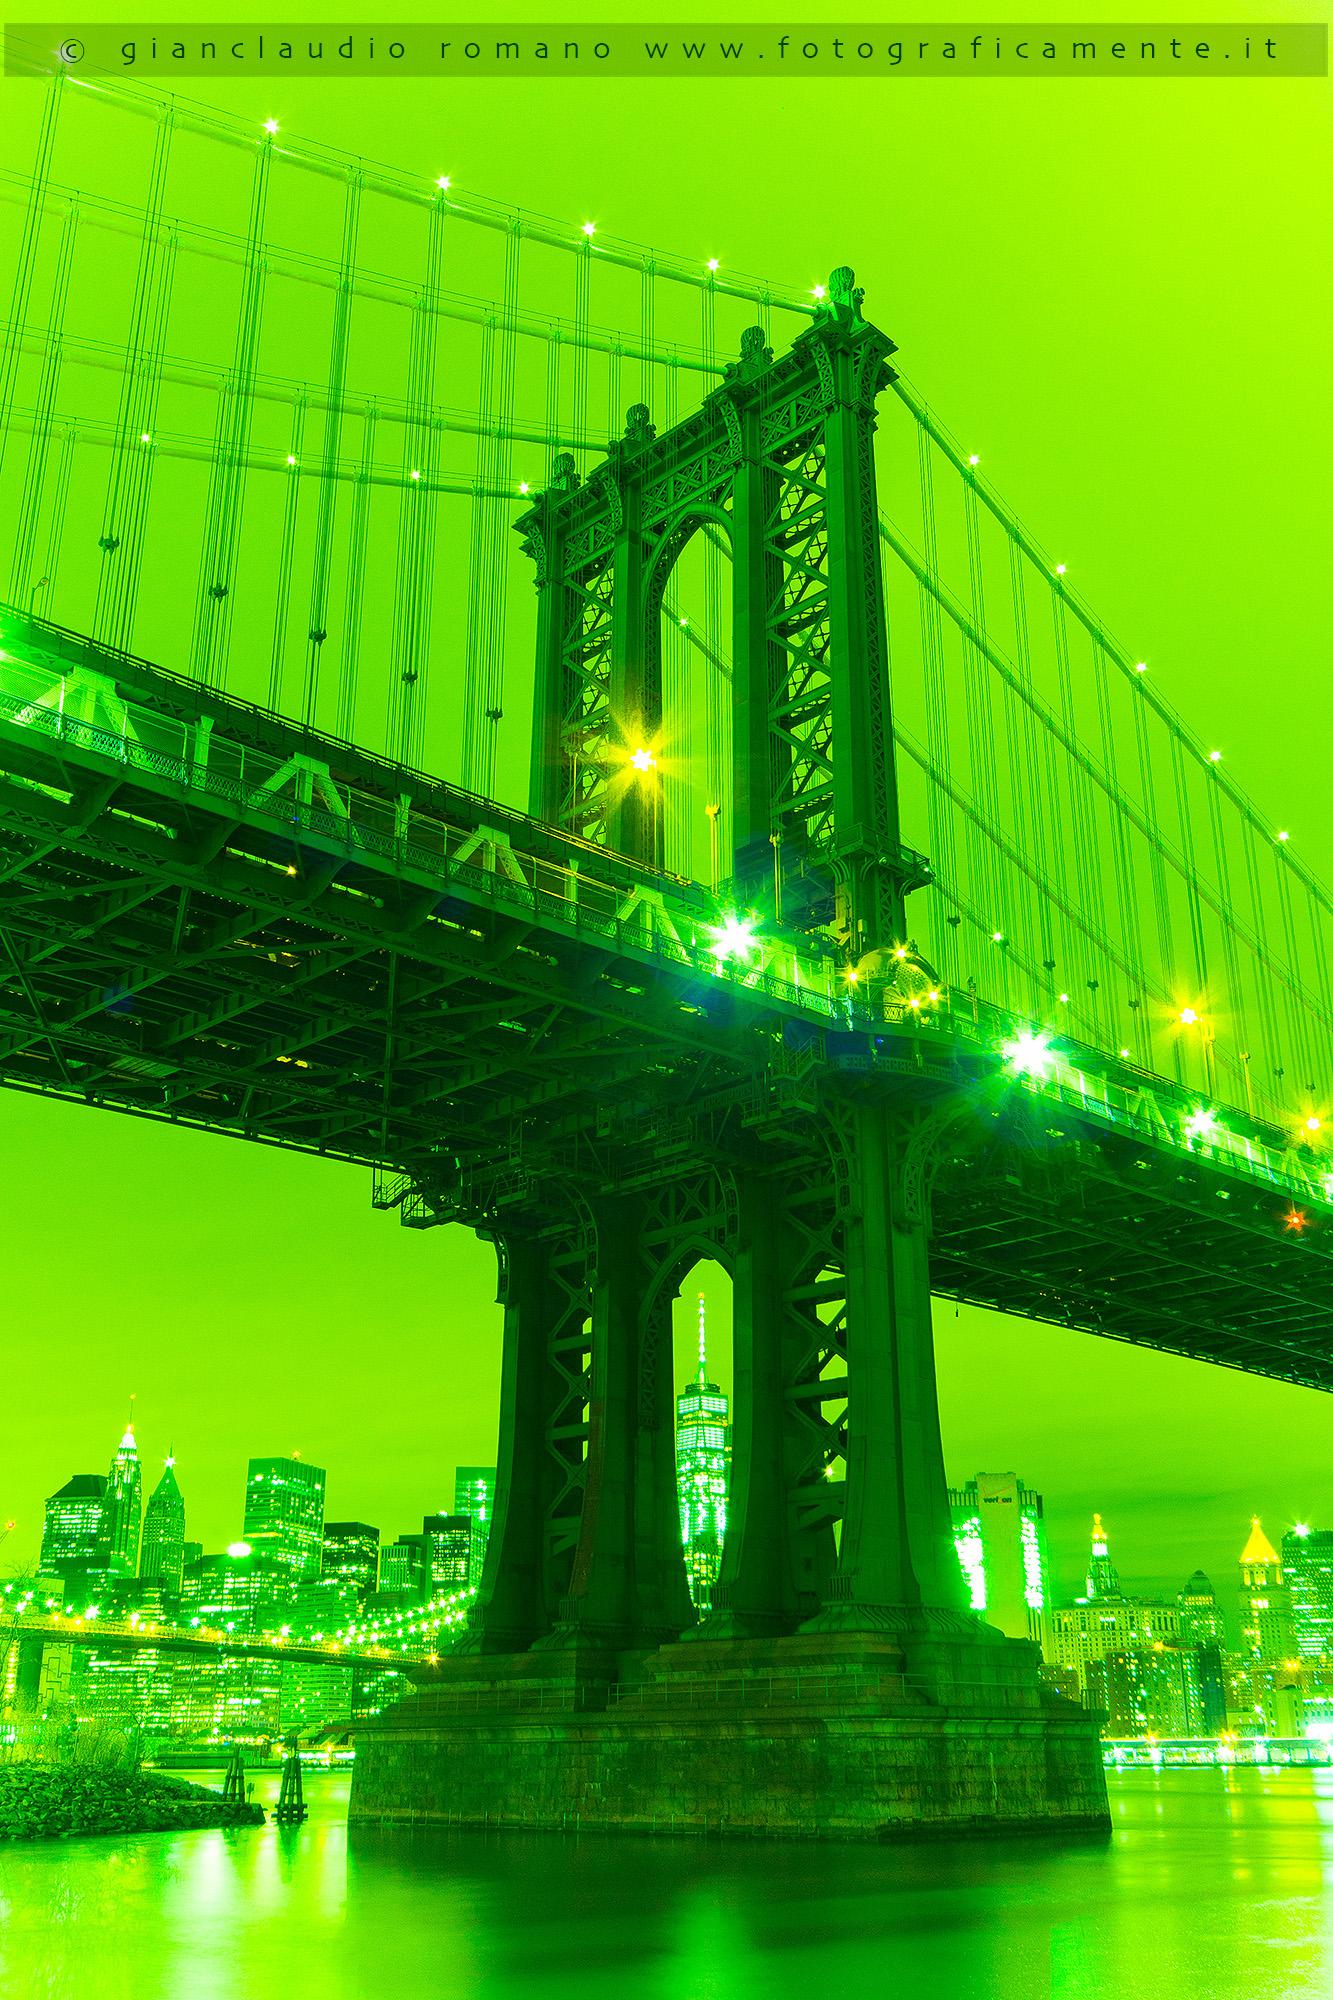 ponte_new_york_MG_9622_1_firmata